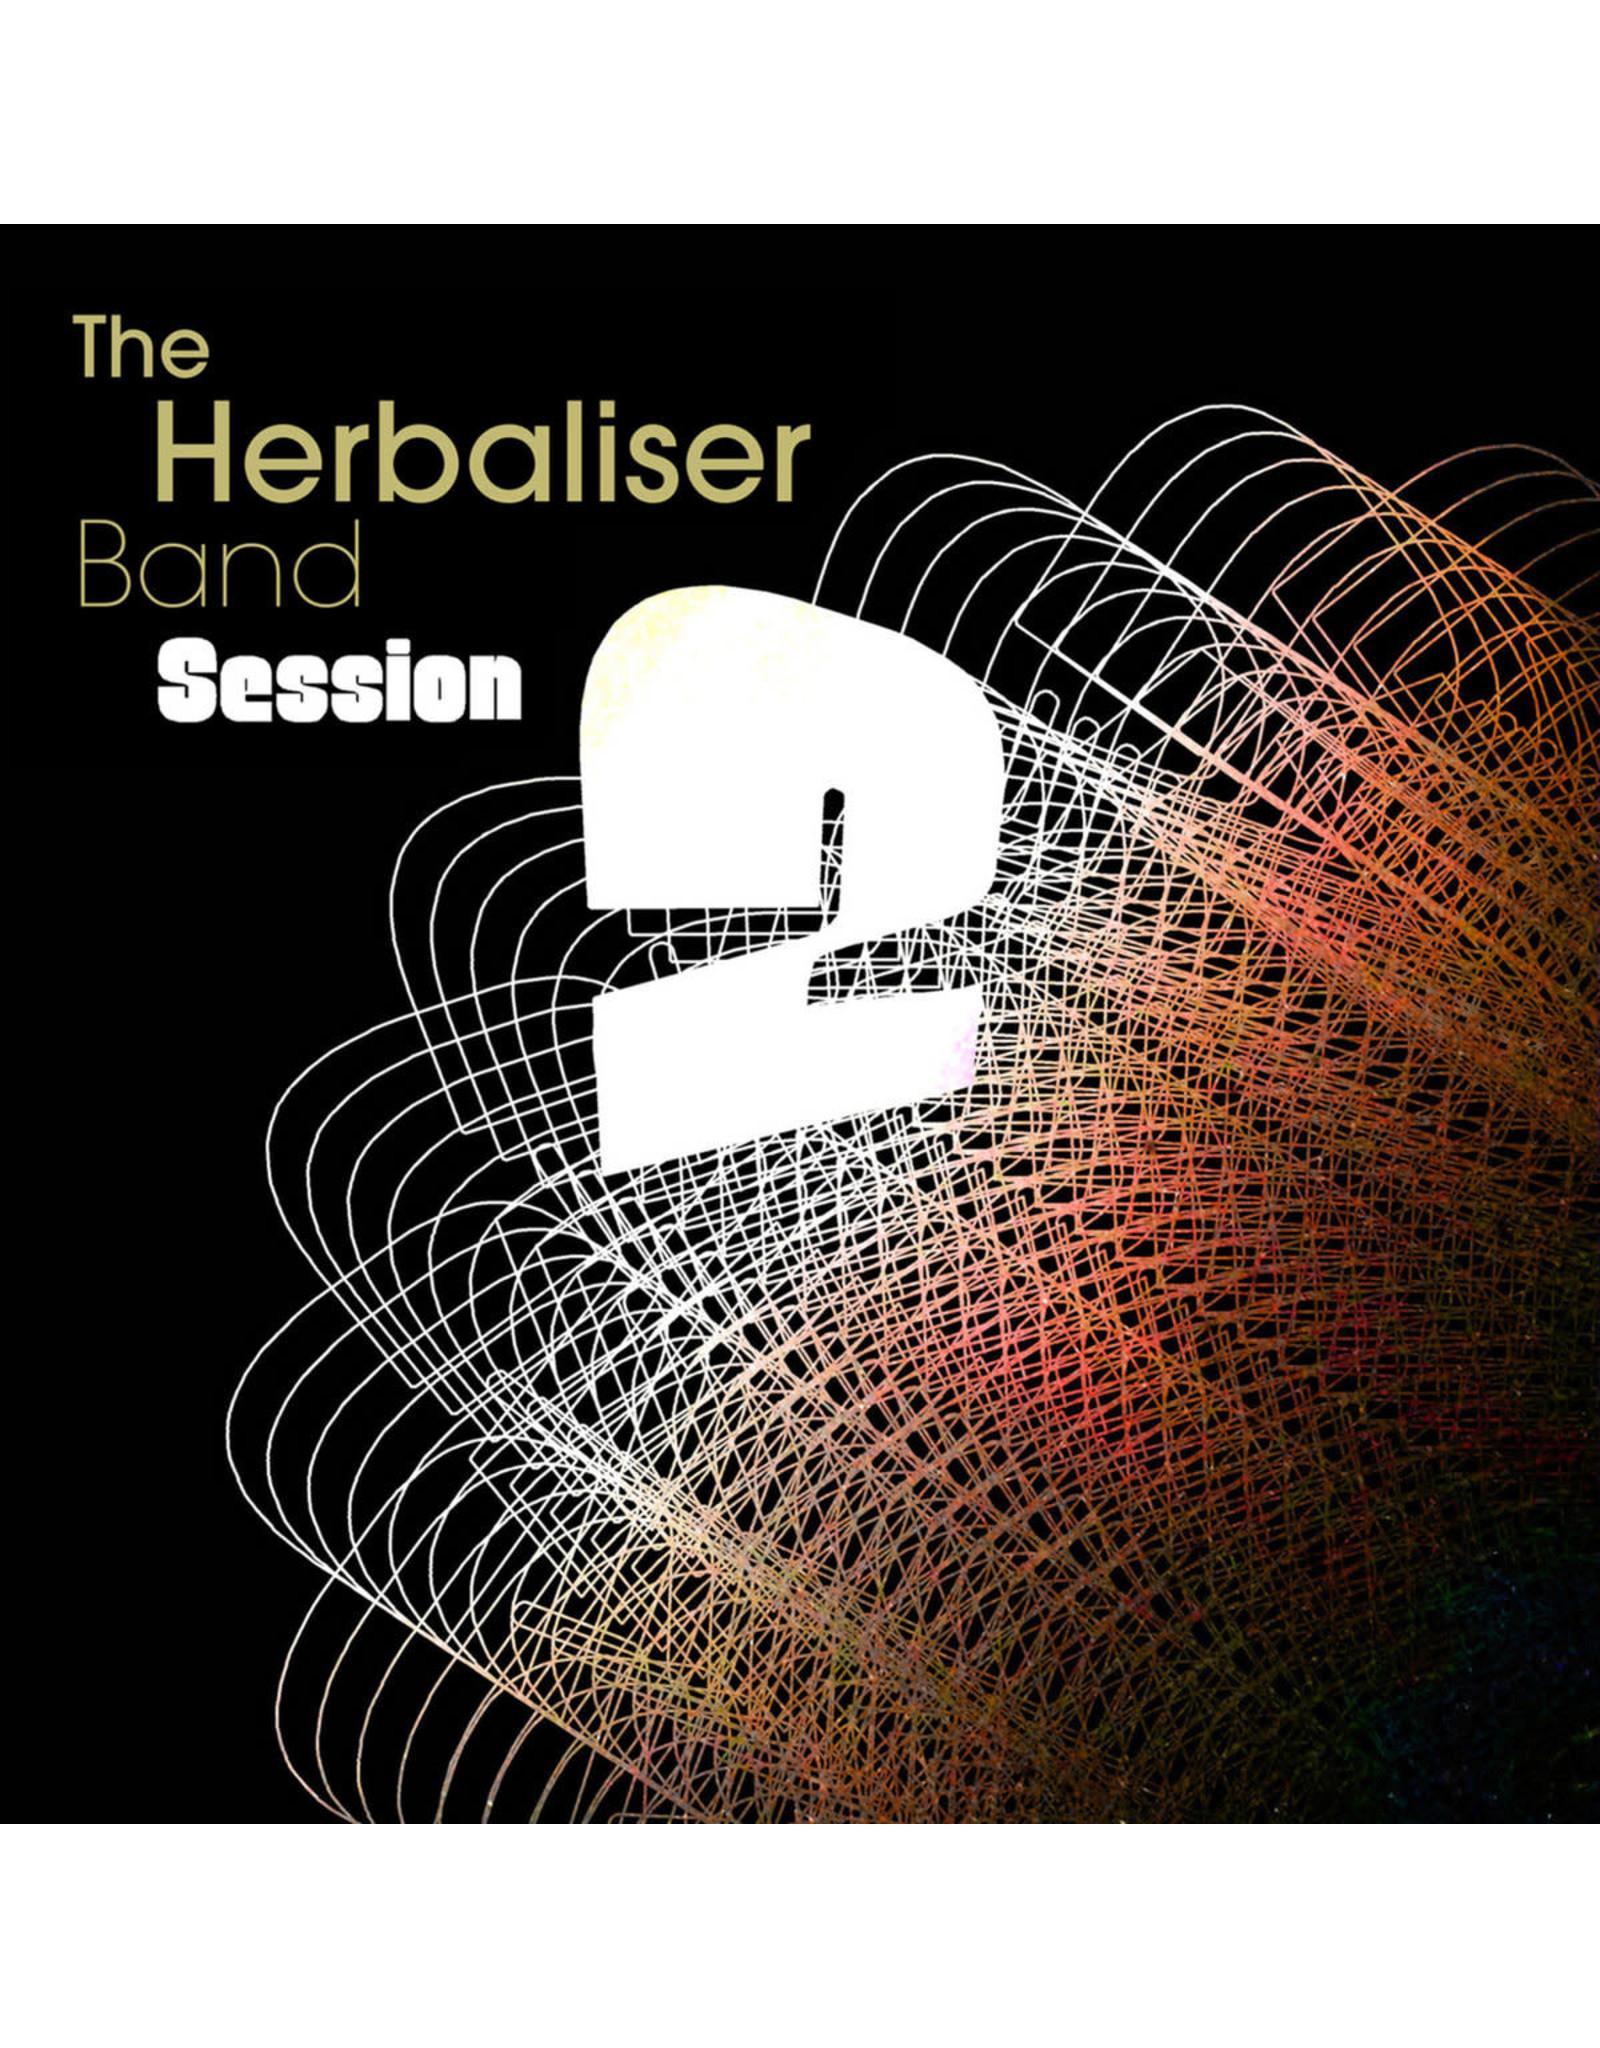 Herbaliser Band - Session 2 CD